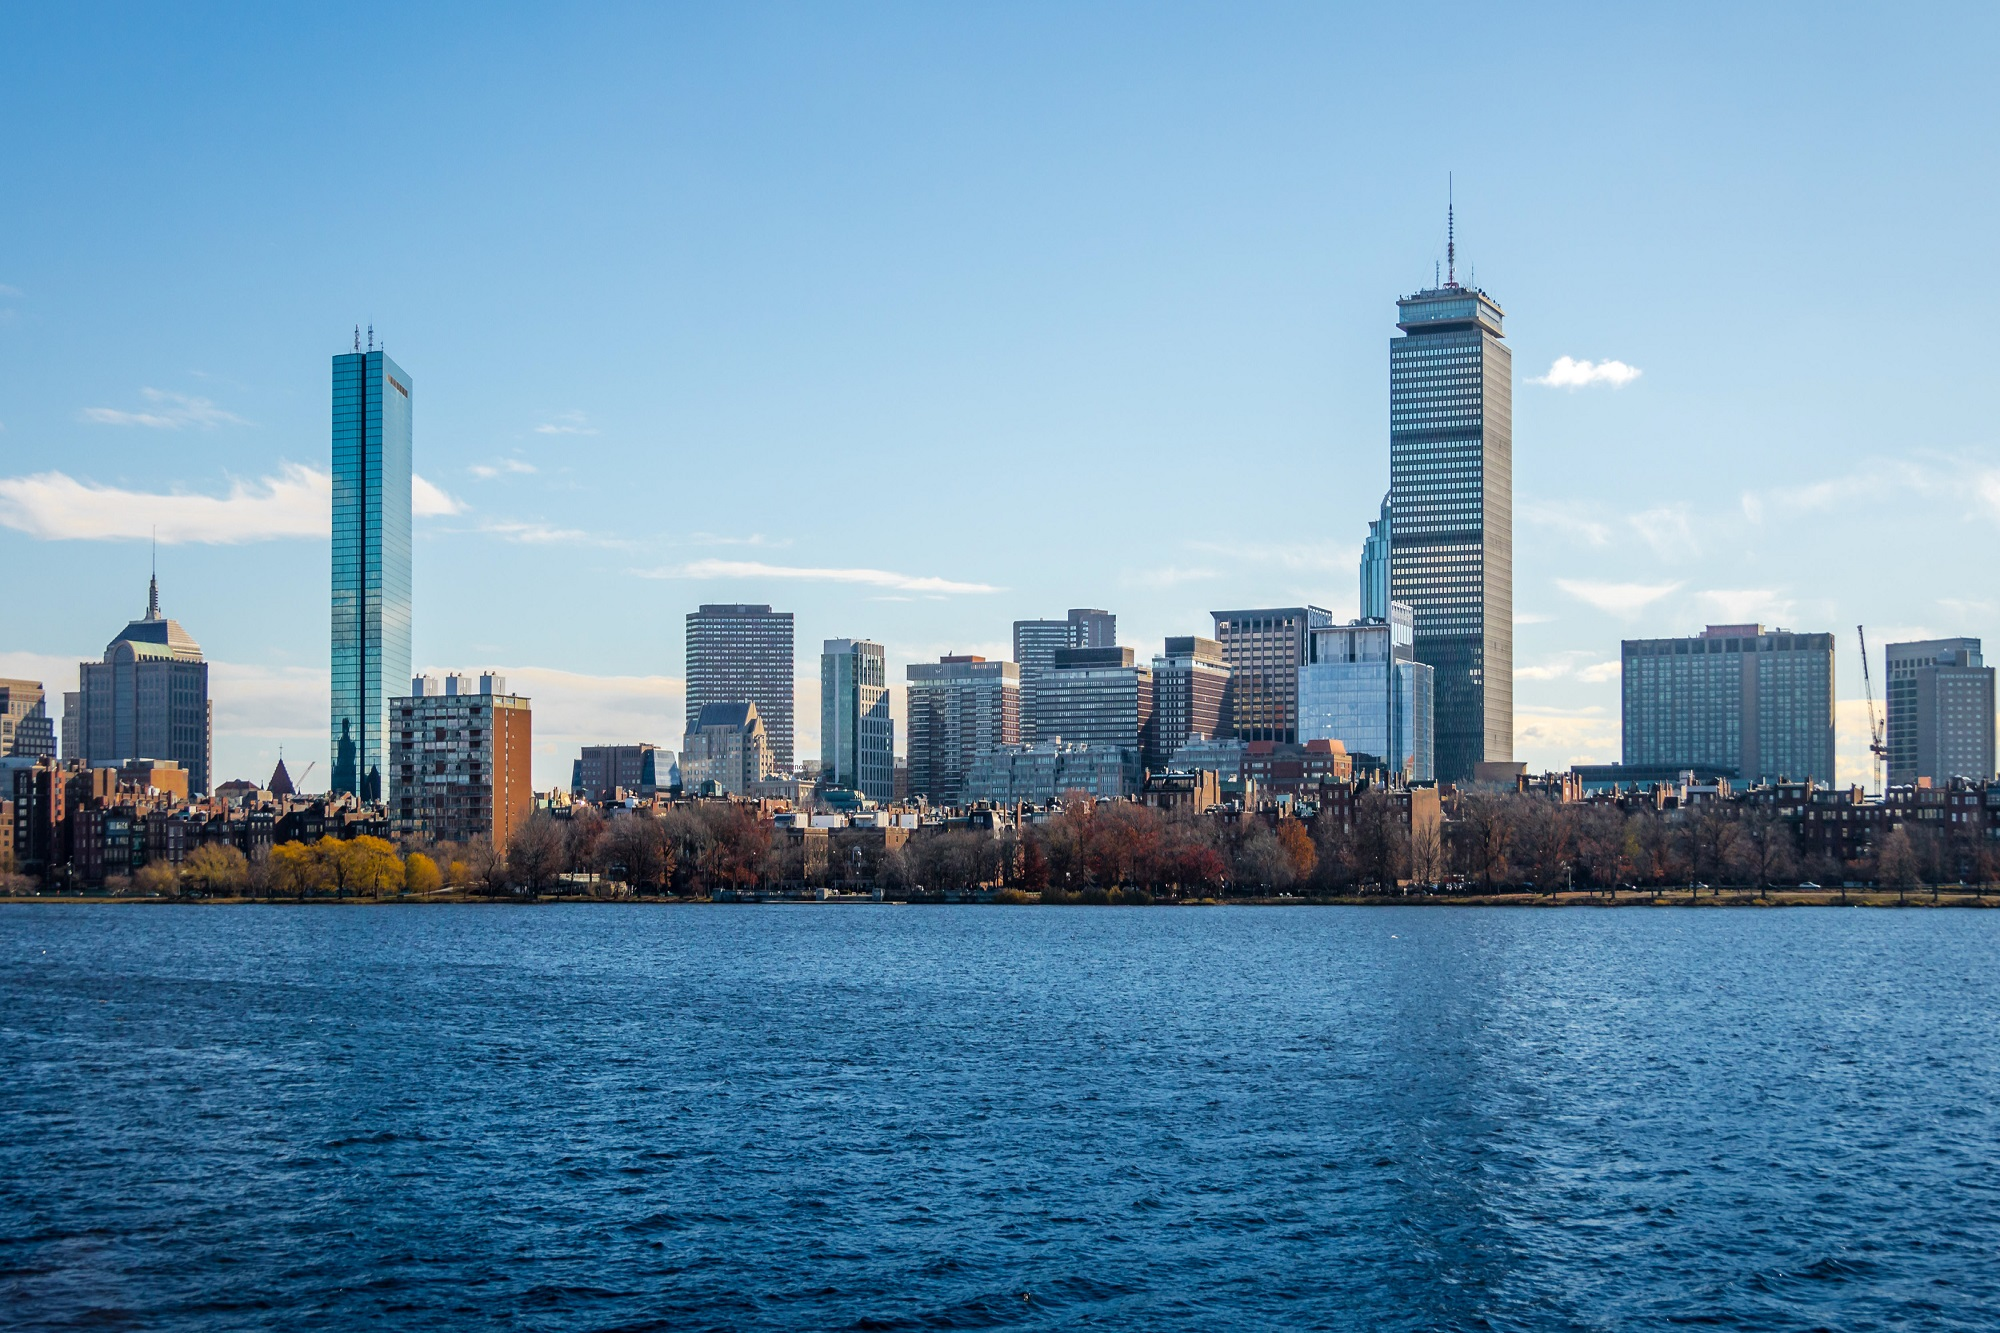 Boston skyline and Charles River seen from Cambridge - Massachusetts, USA